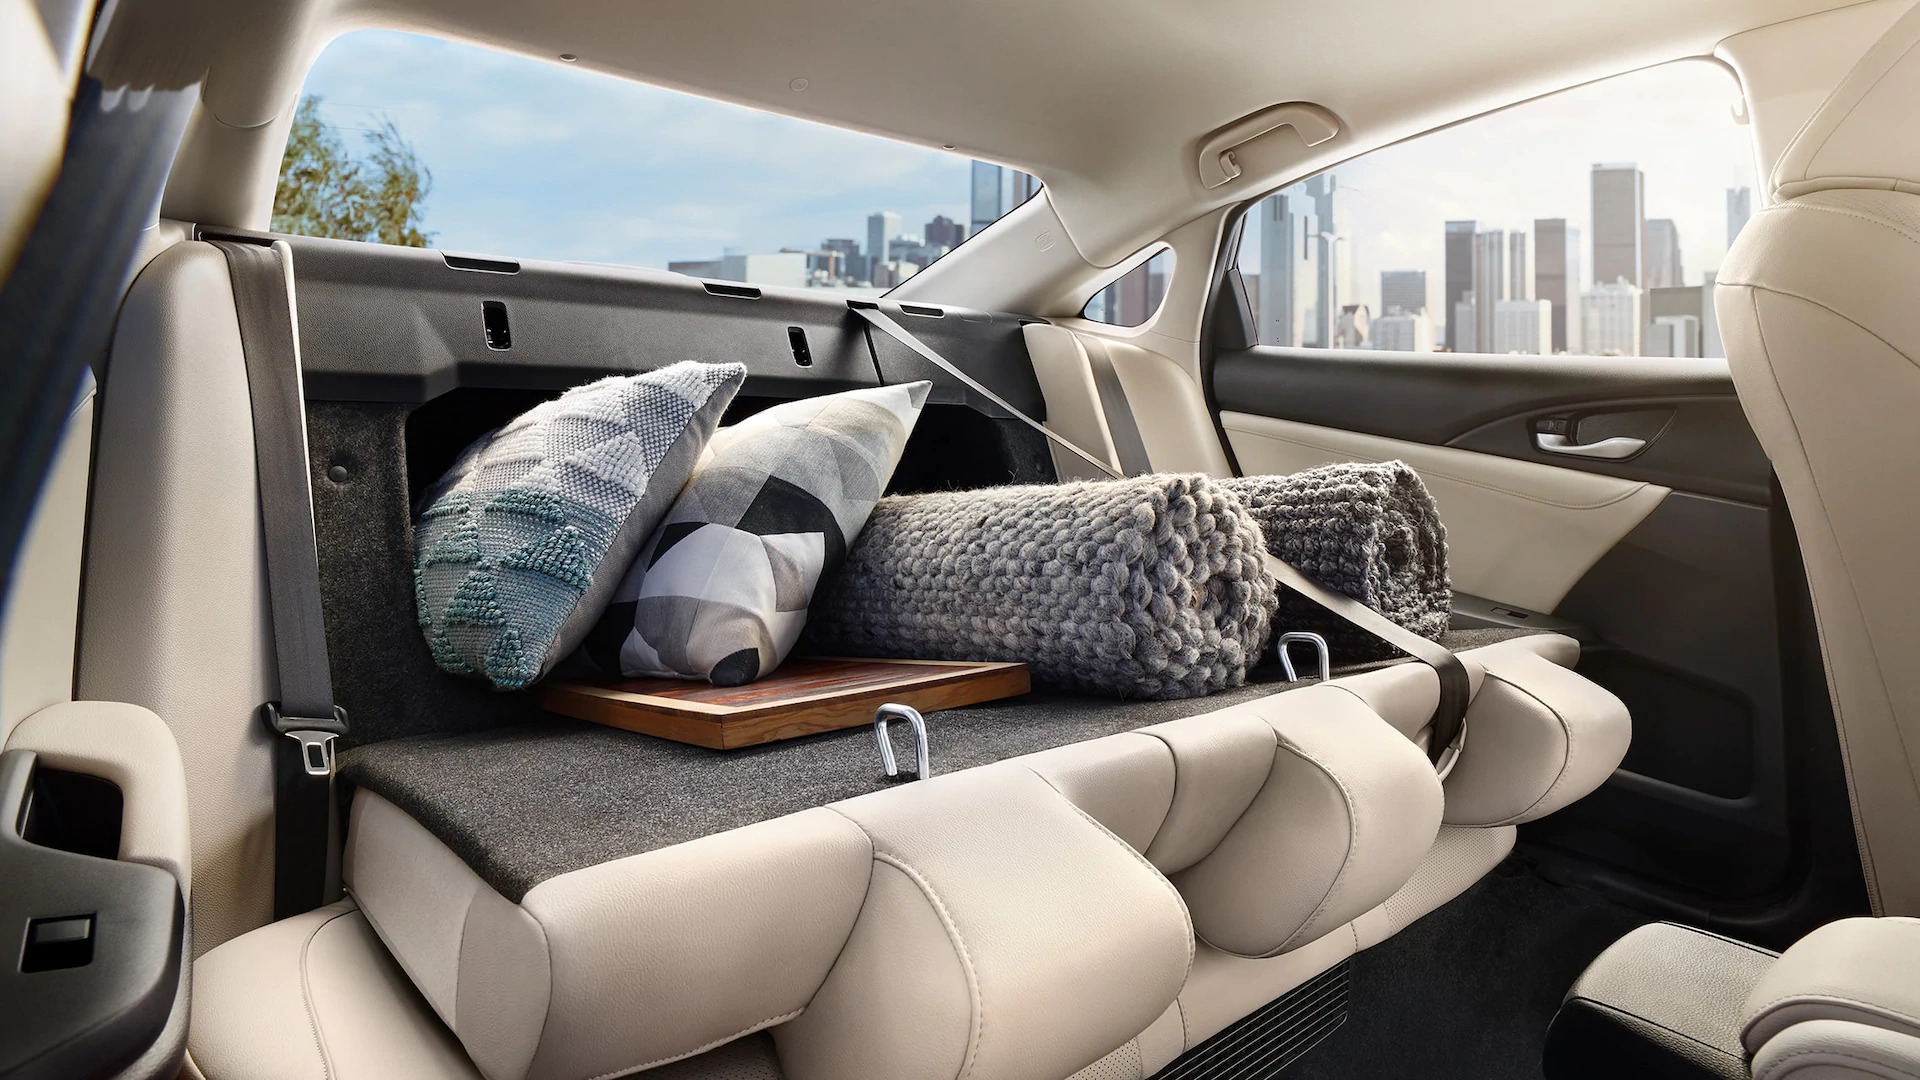 insight interior/exterior cabin